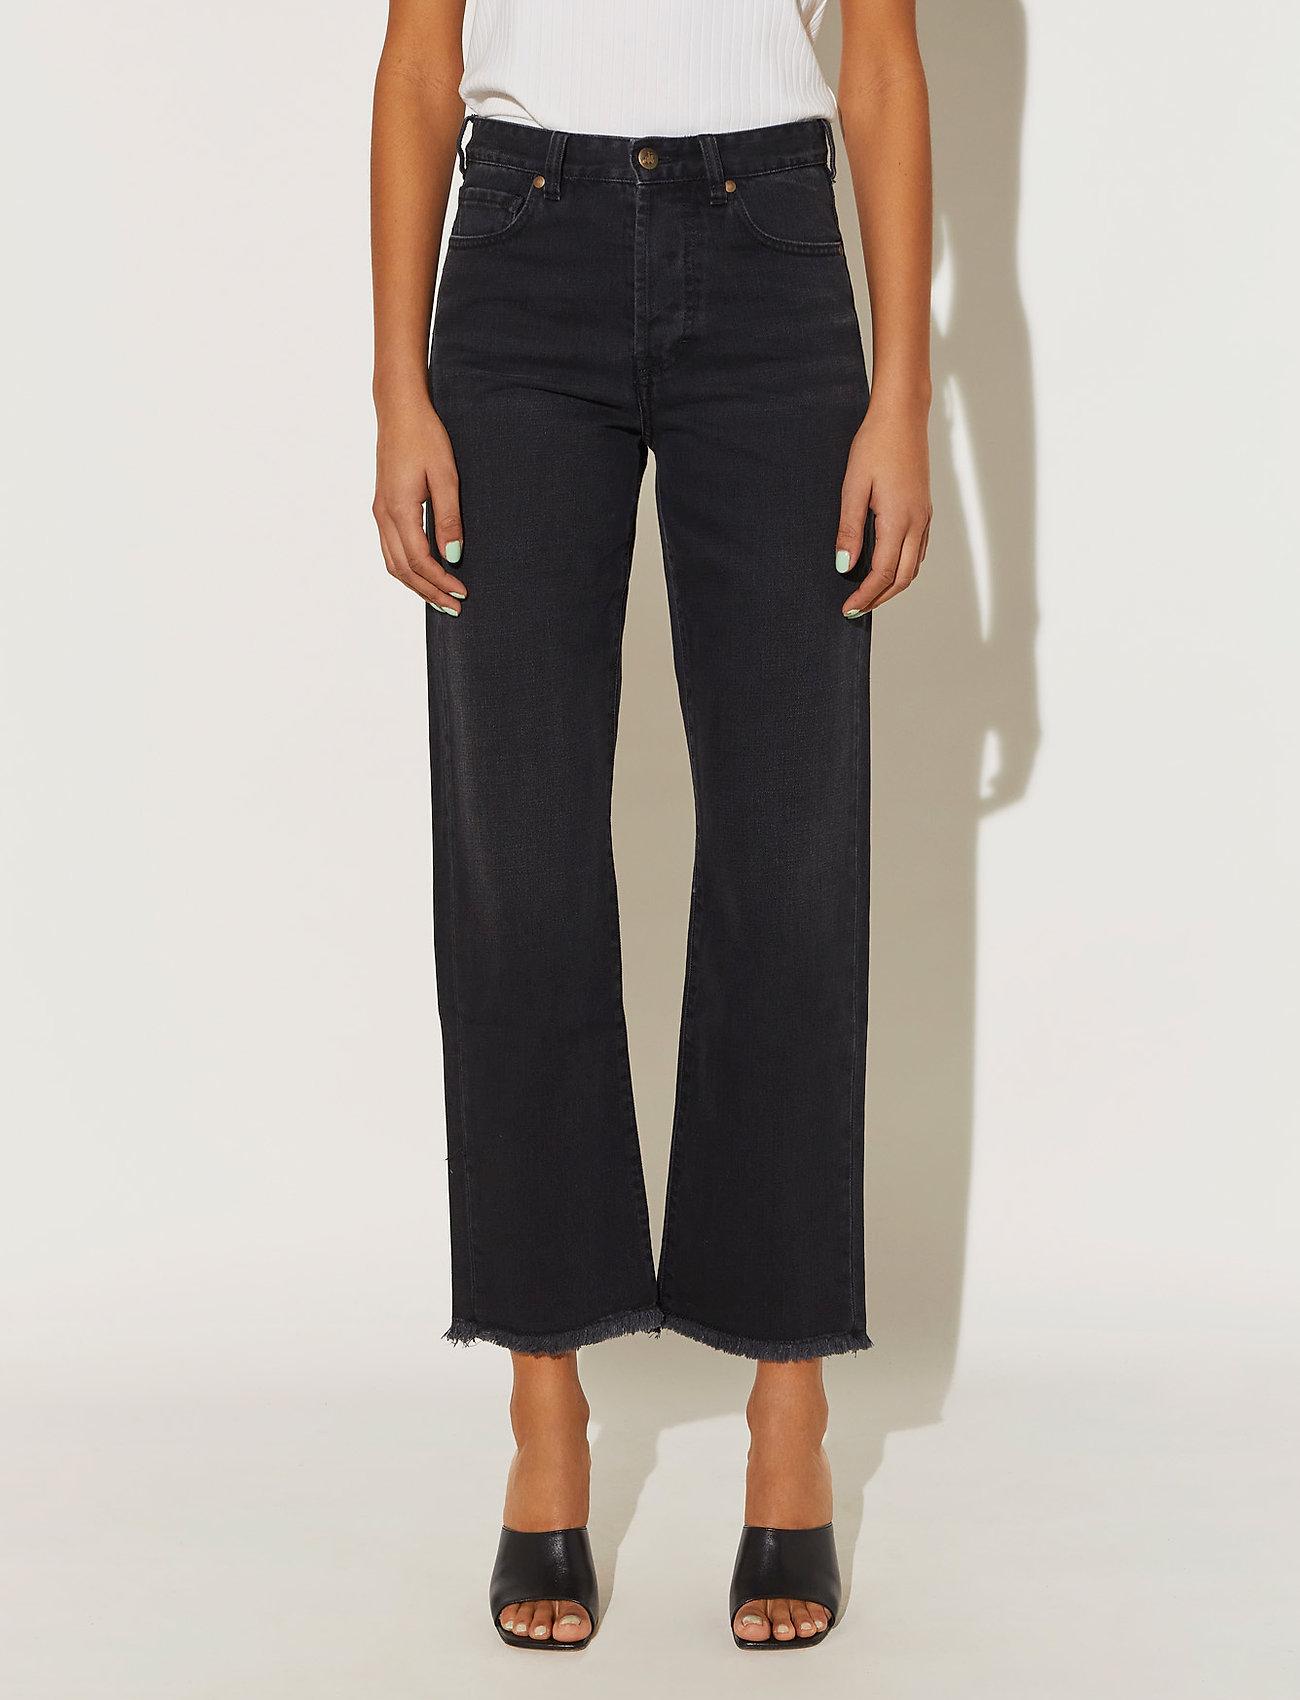 By Malina - Alexa jeans - straight regular - black - 3